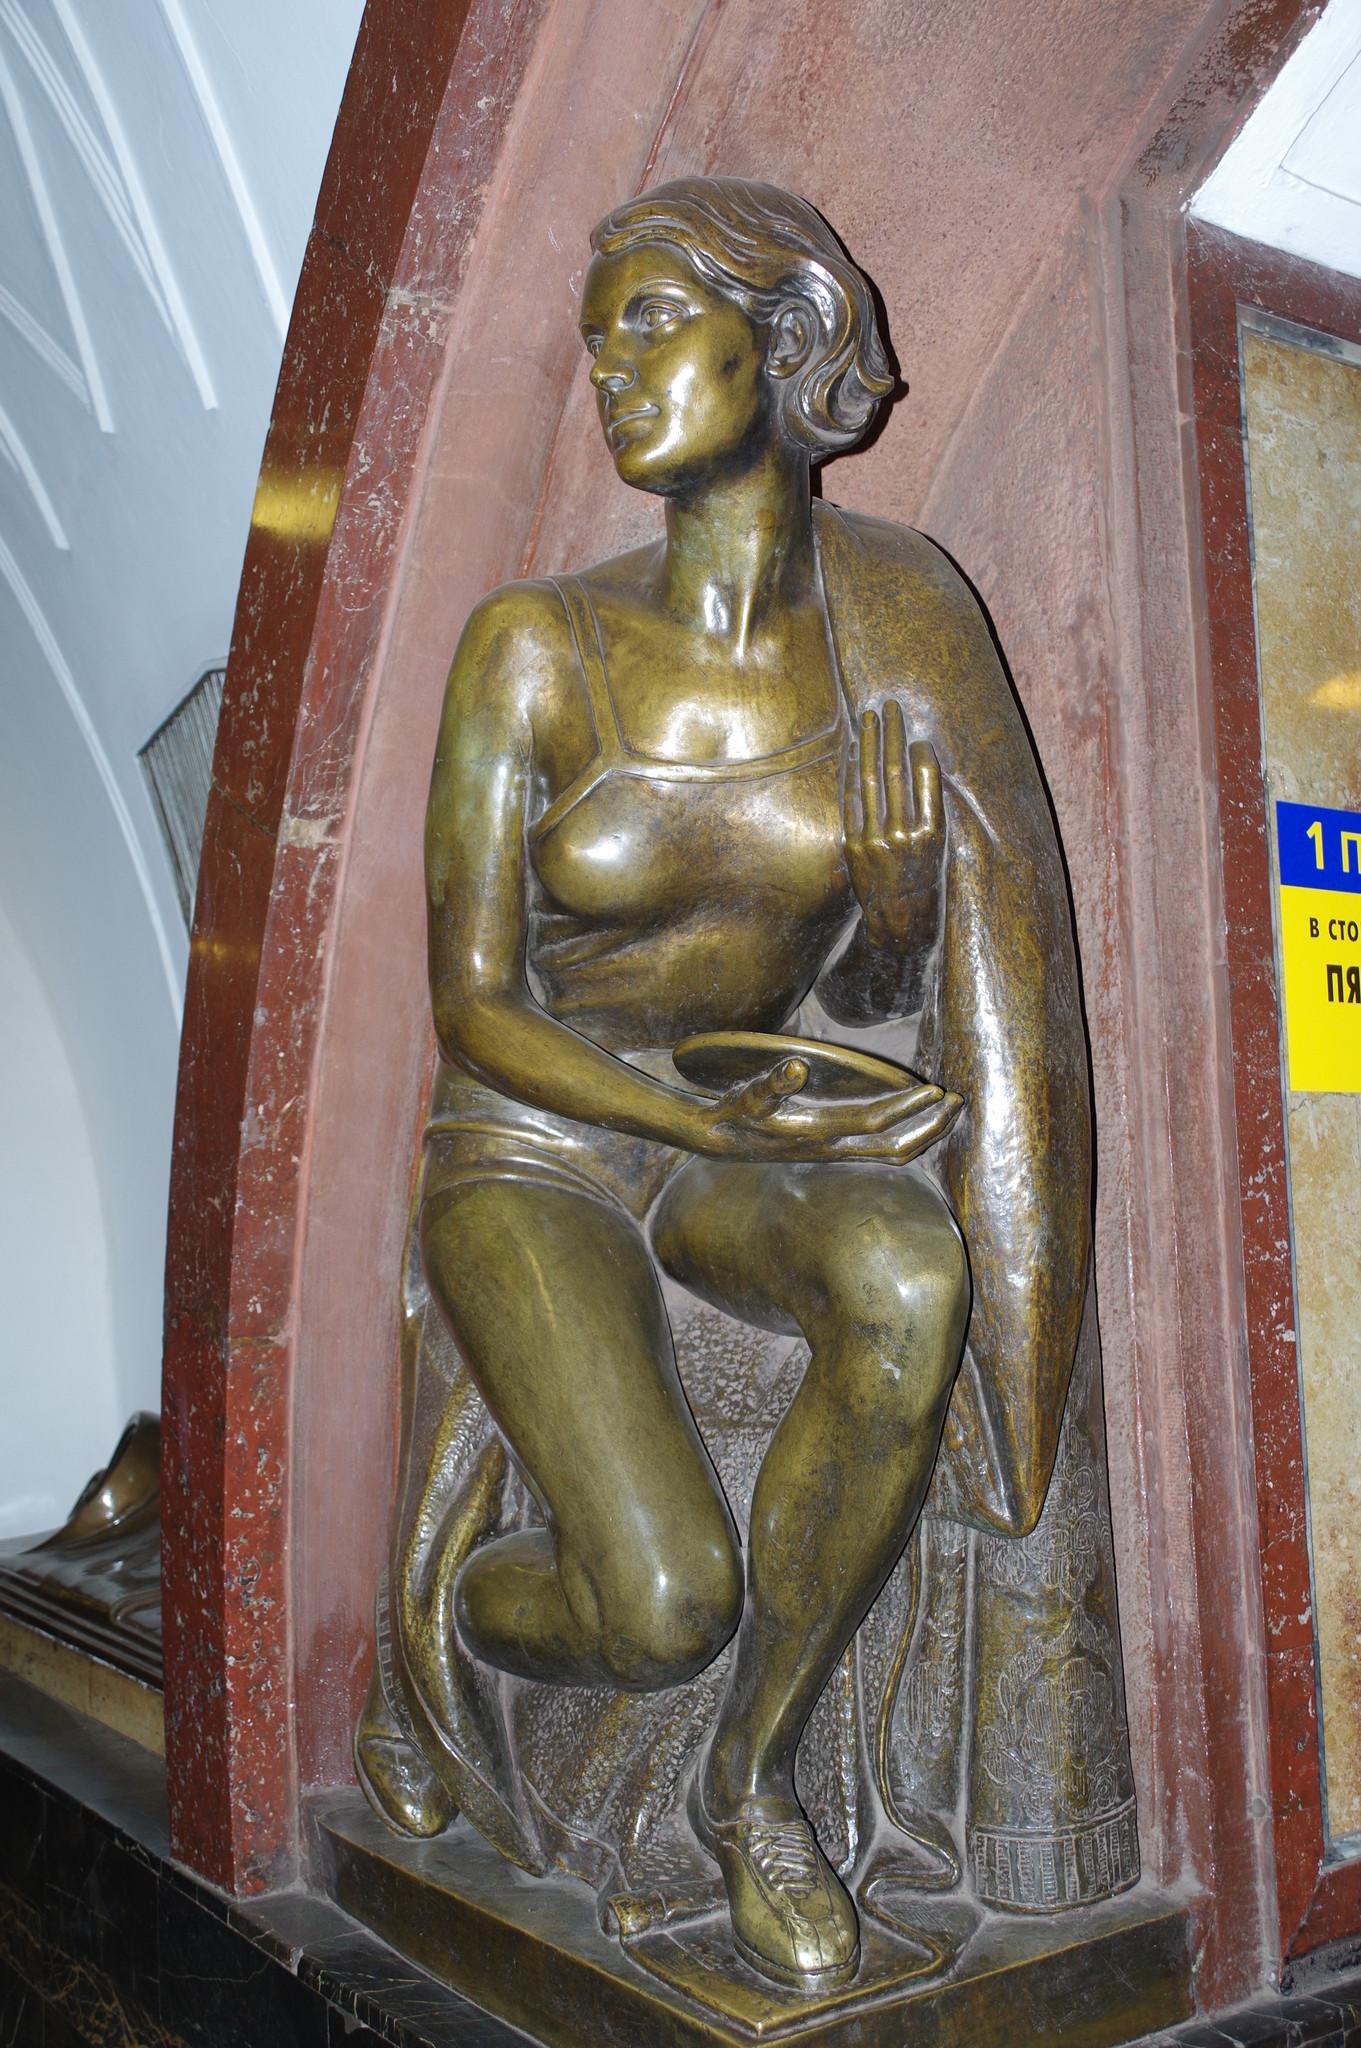 Скульптура «Спортсменка-дискоболка» на станции «Площадь Революции» Московского метрополитена